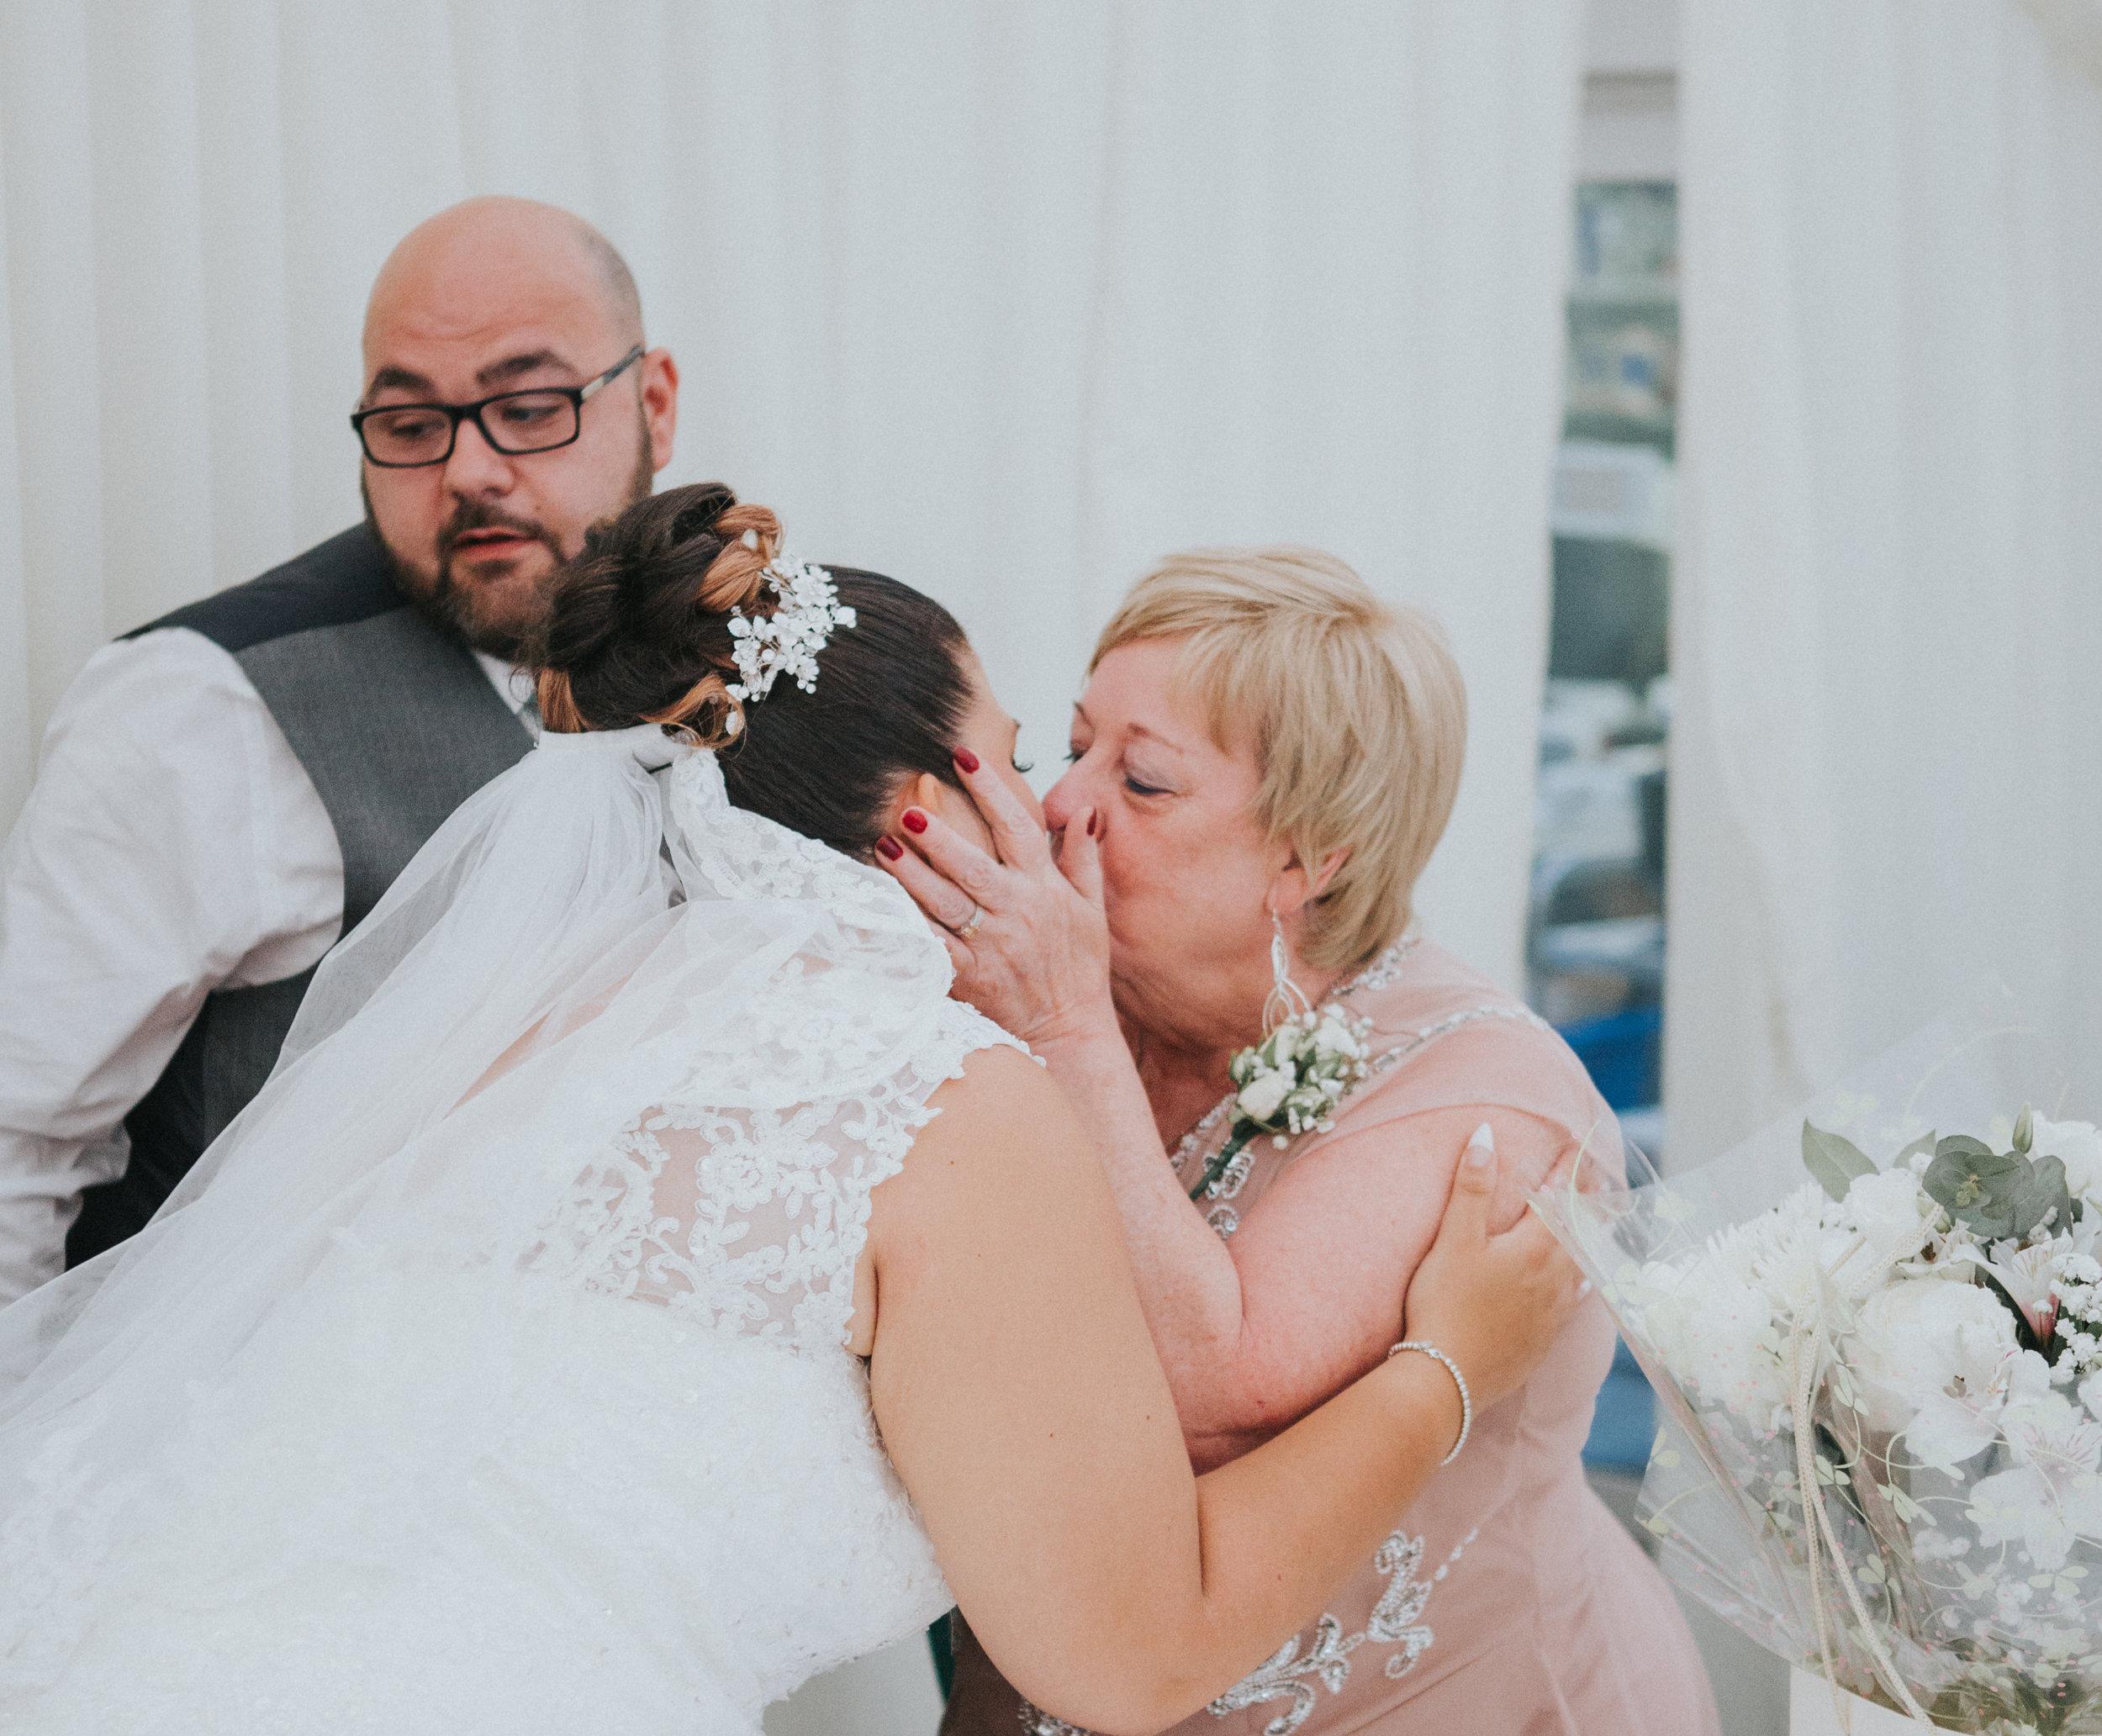 westenhangar-castle-kent-london-wedding-photography-speeches-62